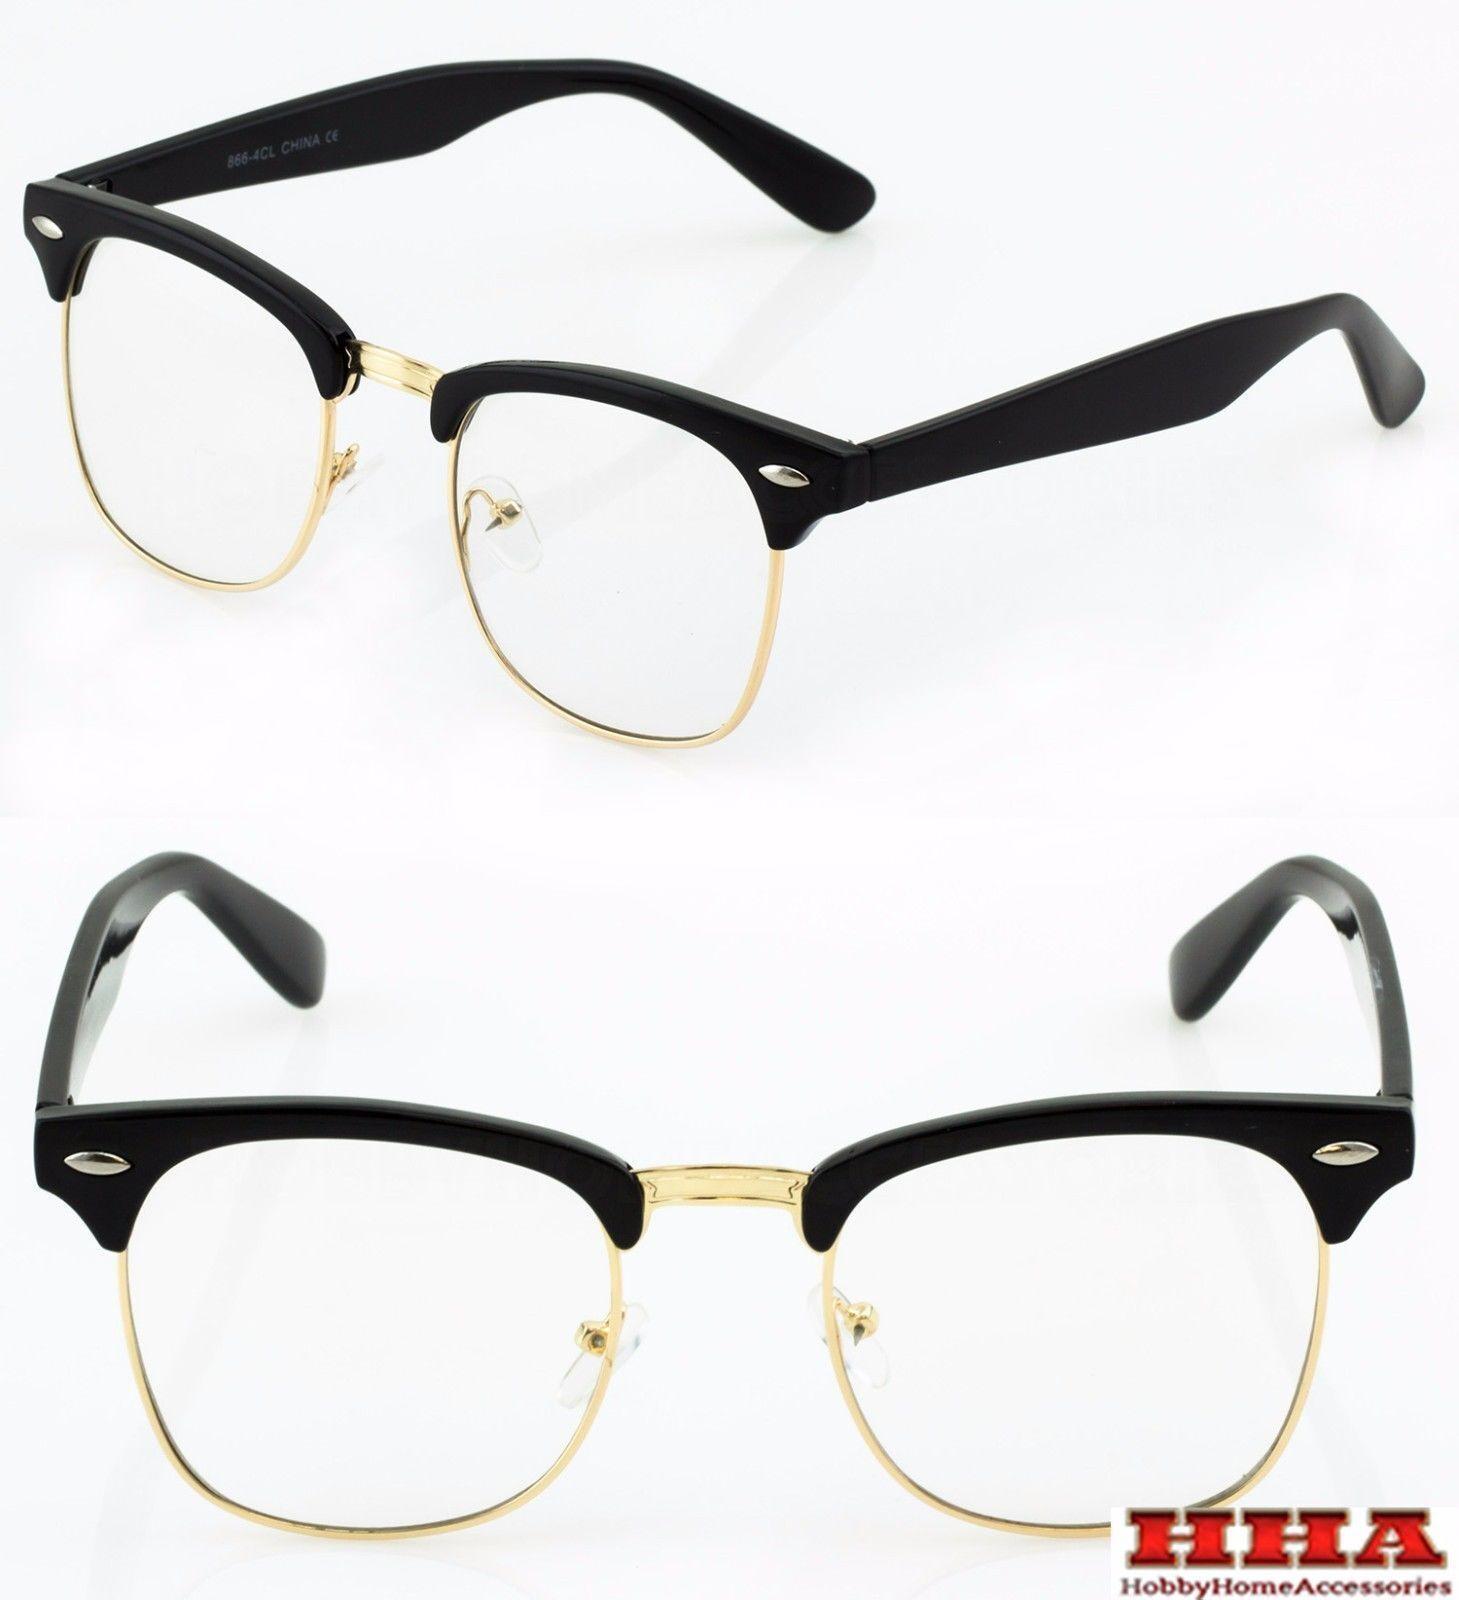 Black and Silver MENS LARGE Clubmaster Wayfarer Style Glasses Clear Lens Half Frame Retro Nerd